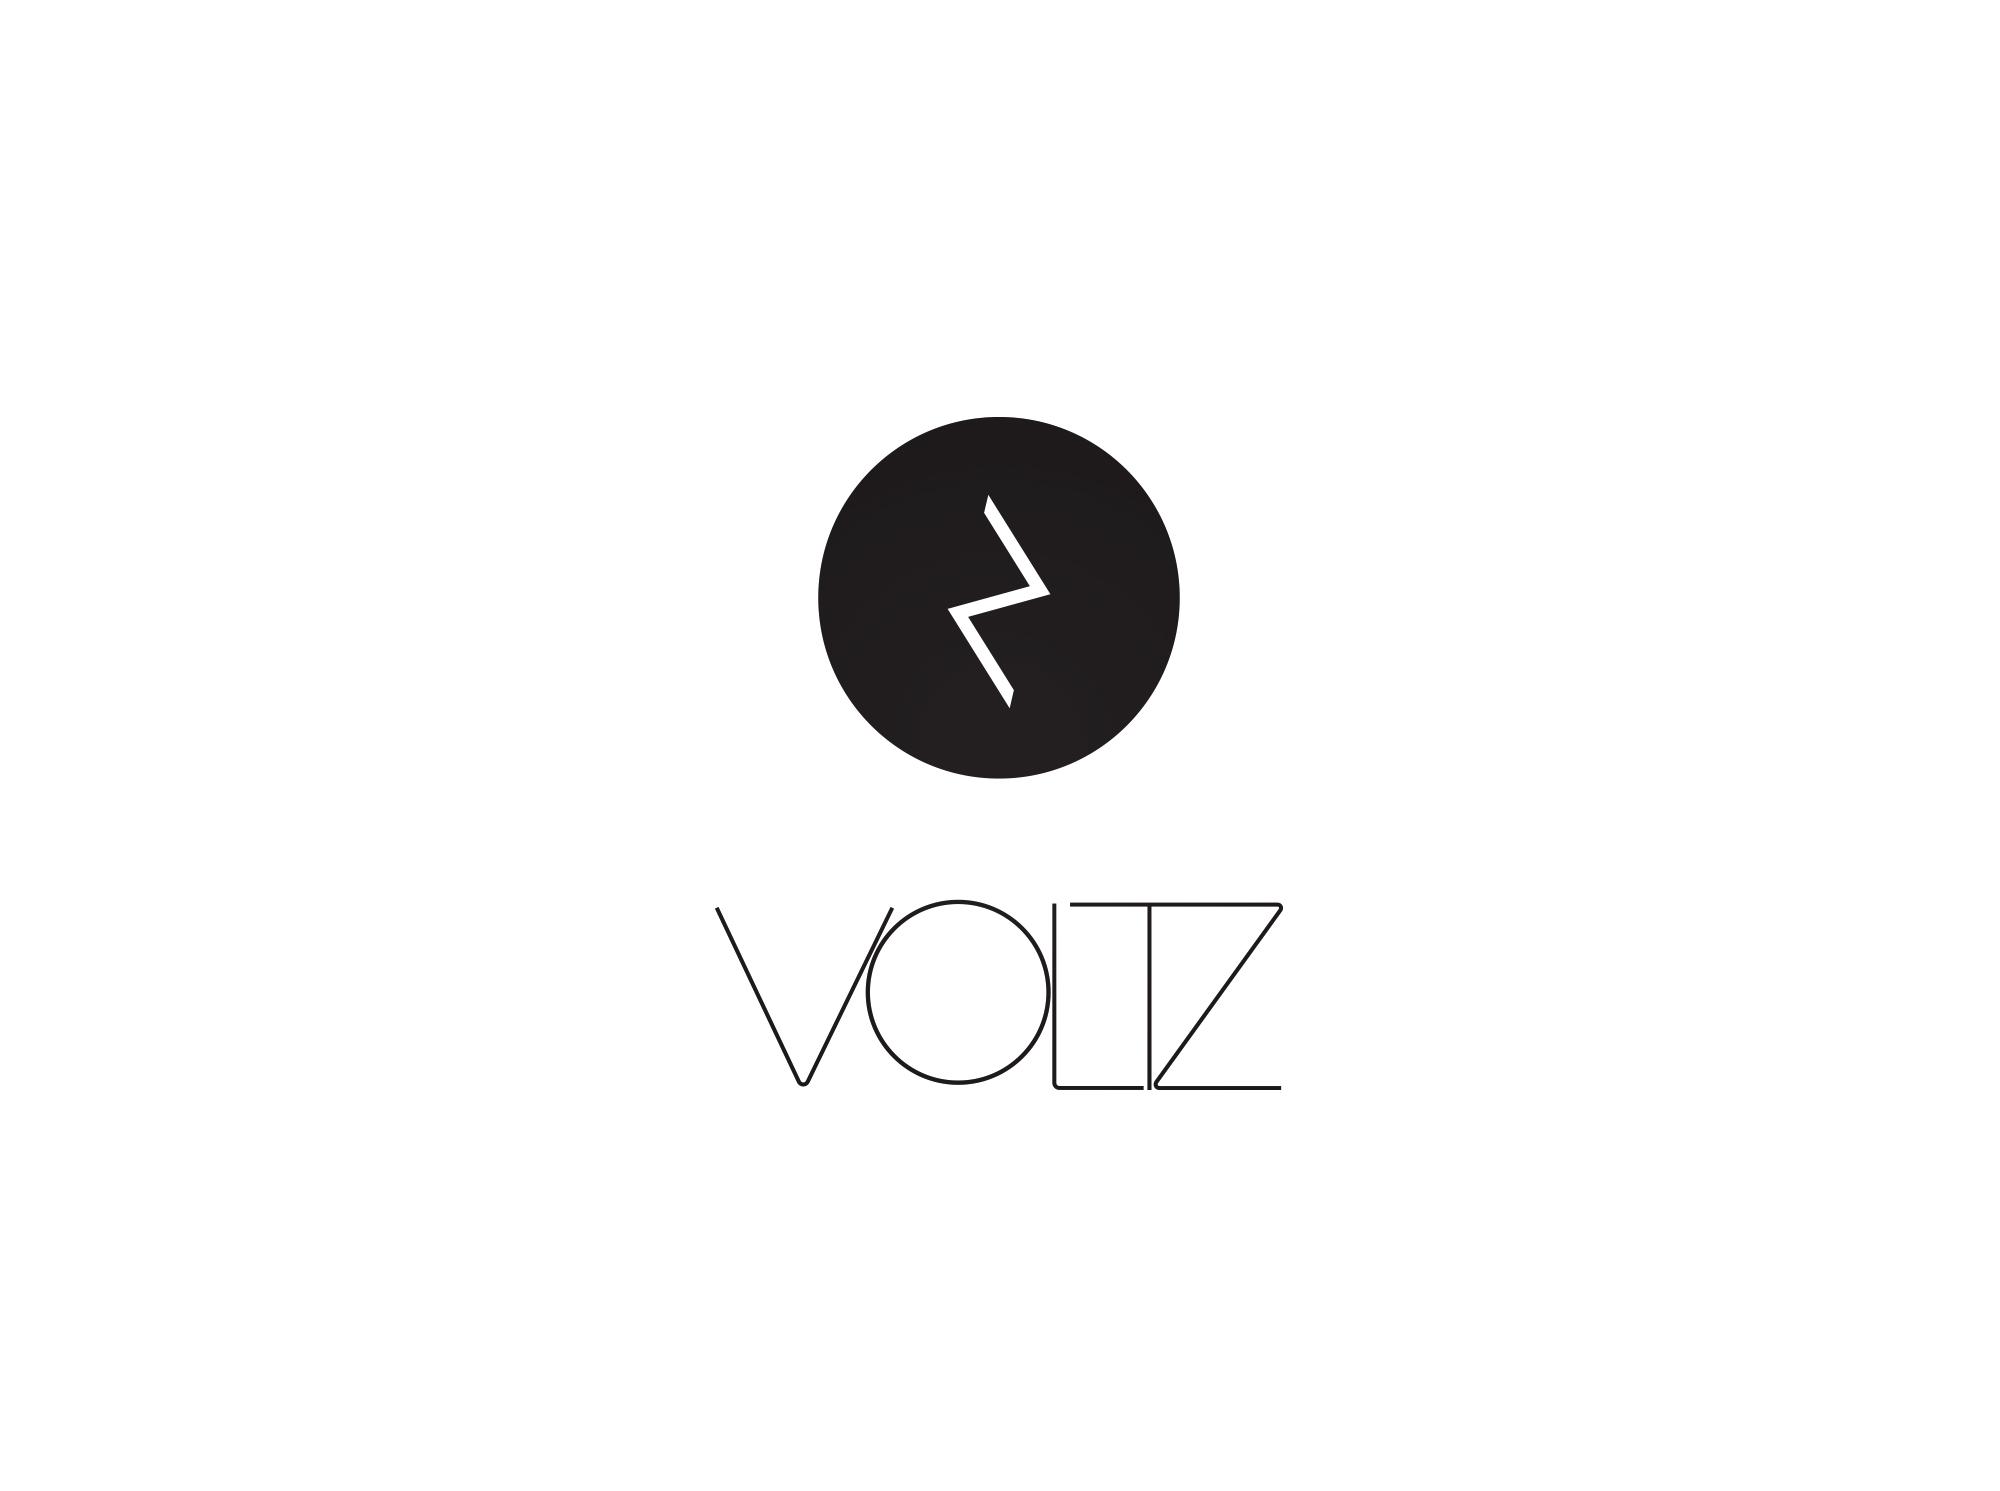 projeto_img_vtz3